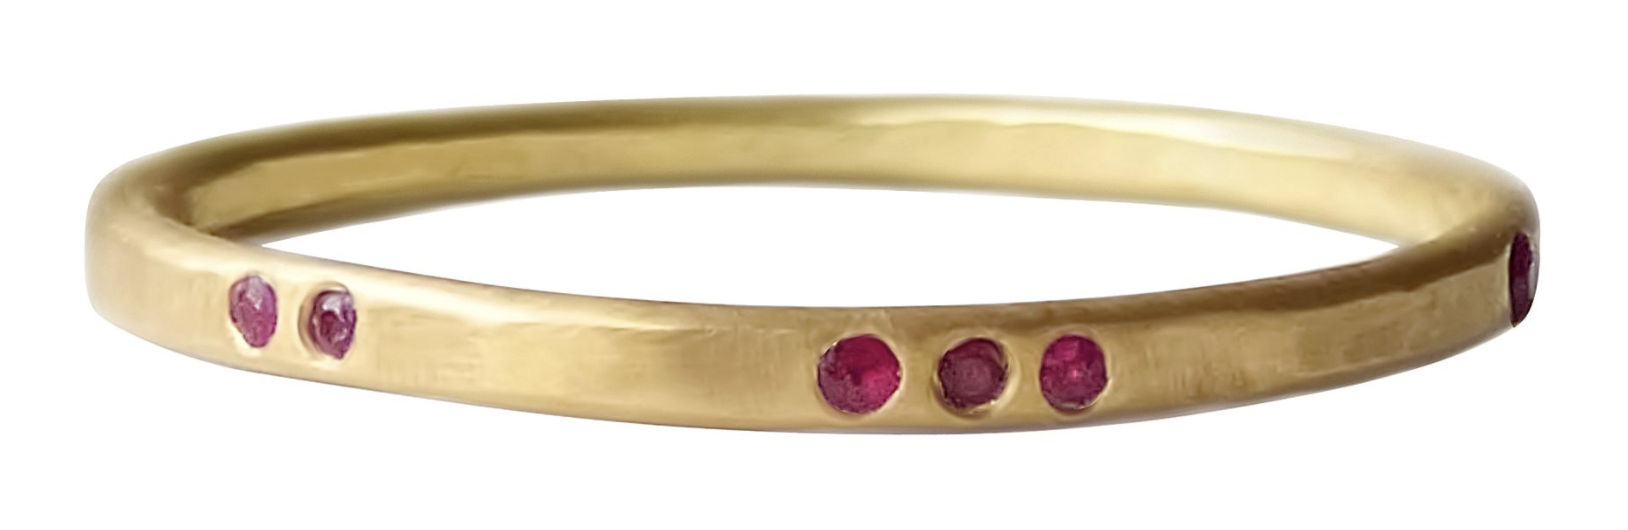 best-july-birthstone-jewellery-for-july-birthdays-shakti-ellenwood